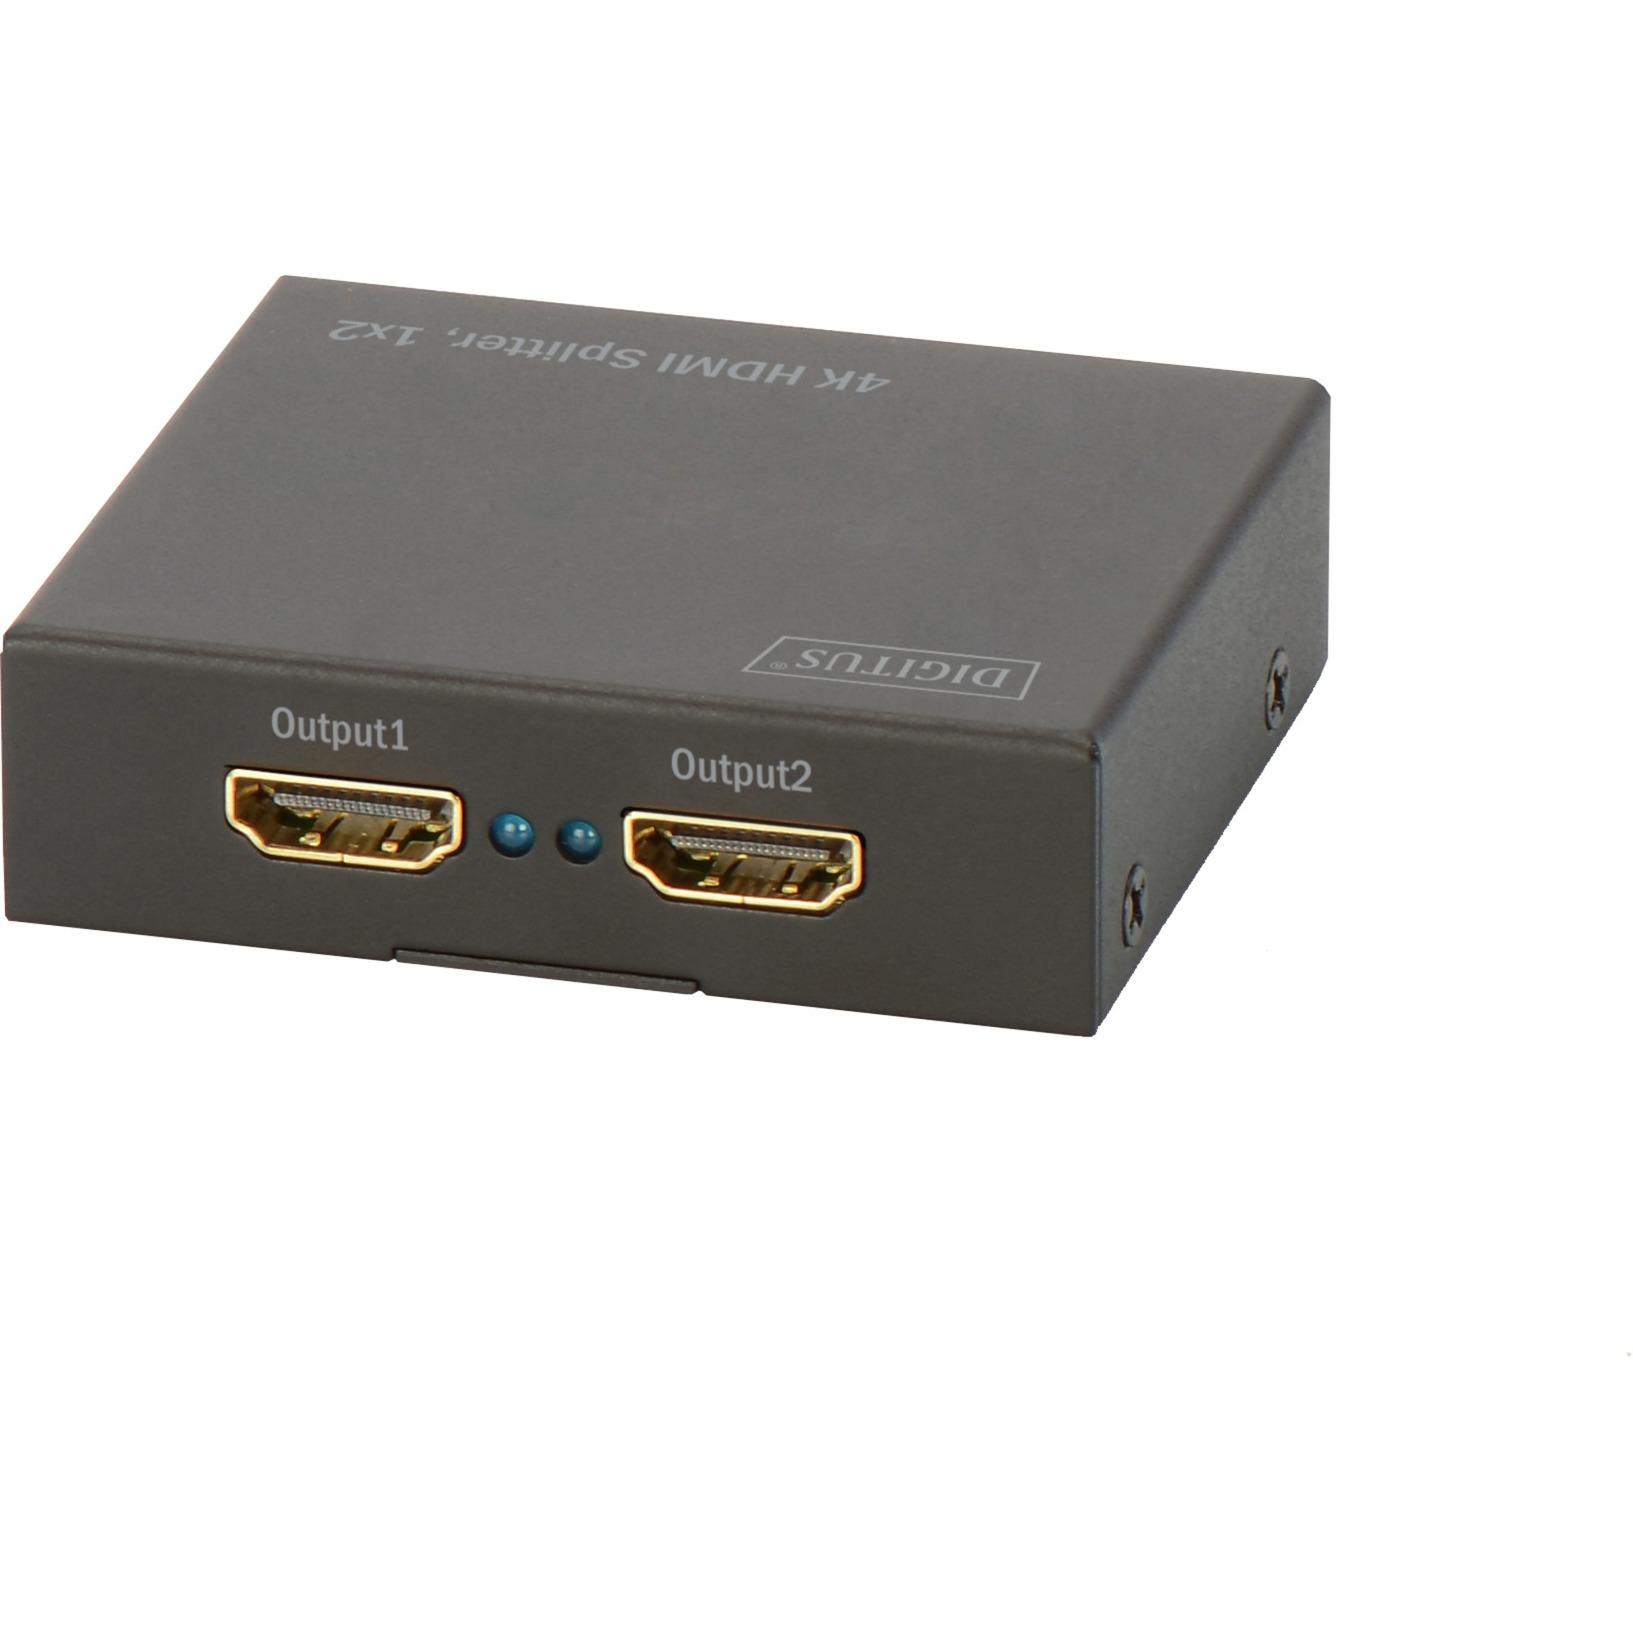 DS-46304 HDMI divisor de video, Divisores & Conmutadores